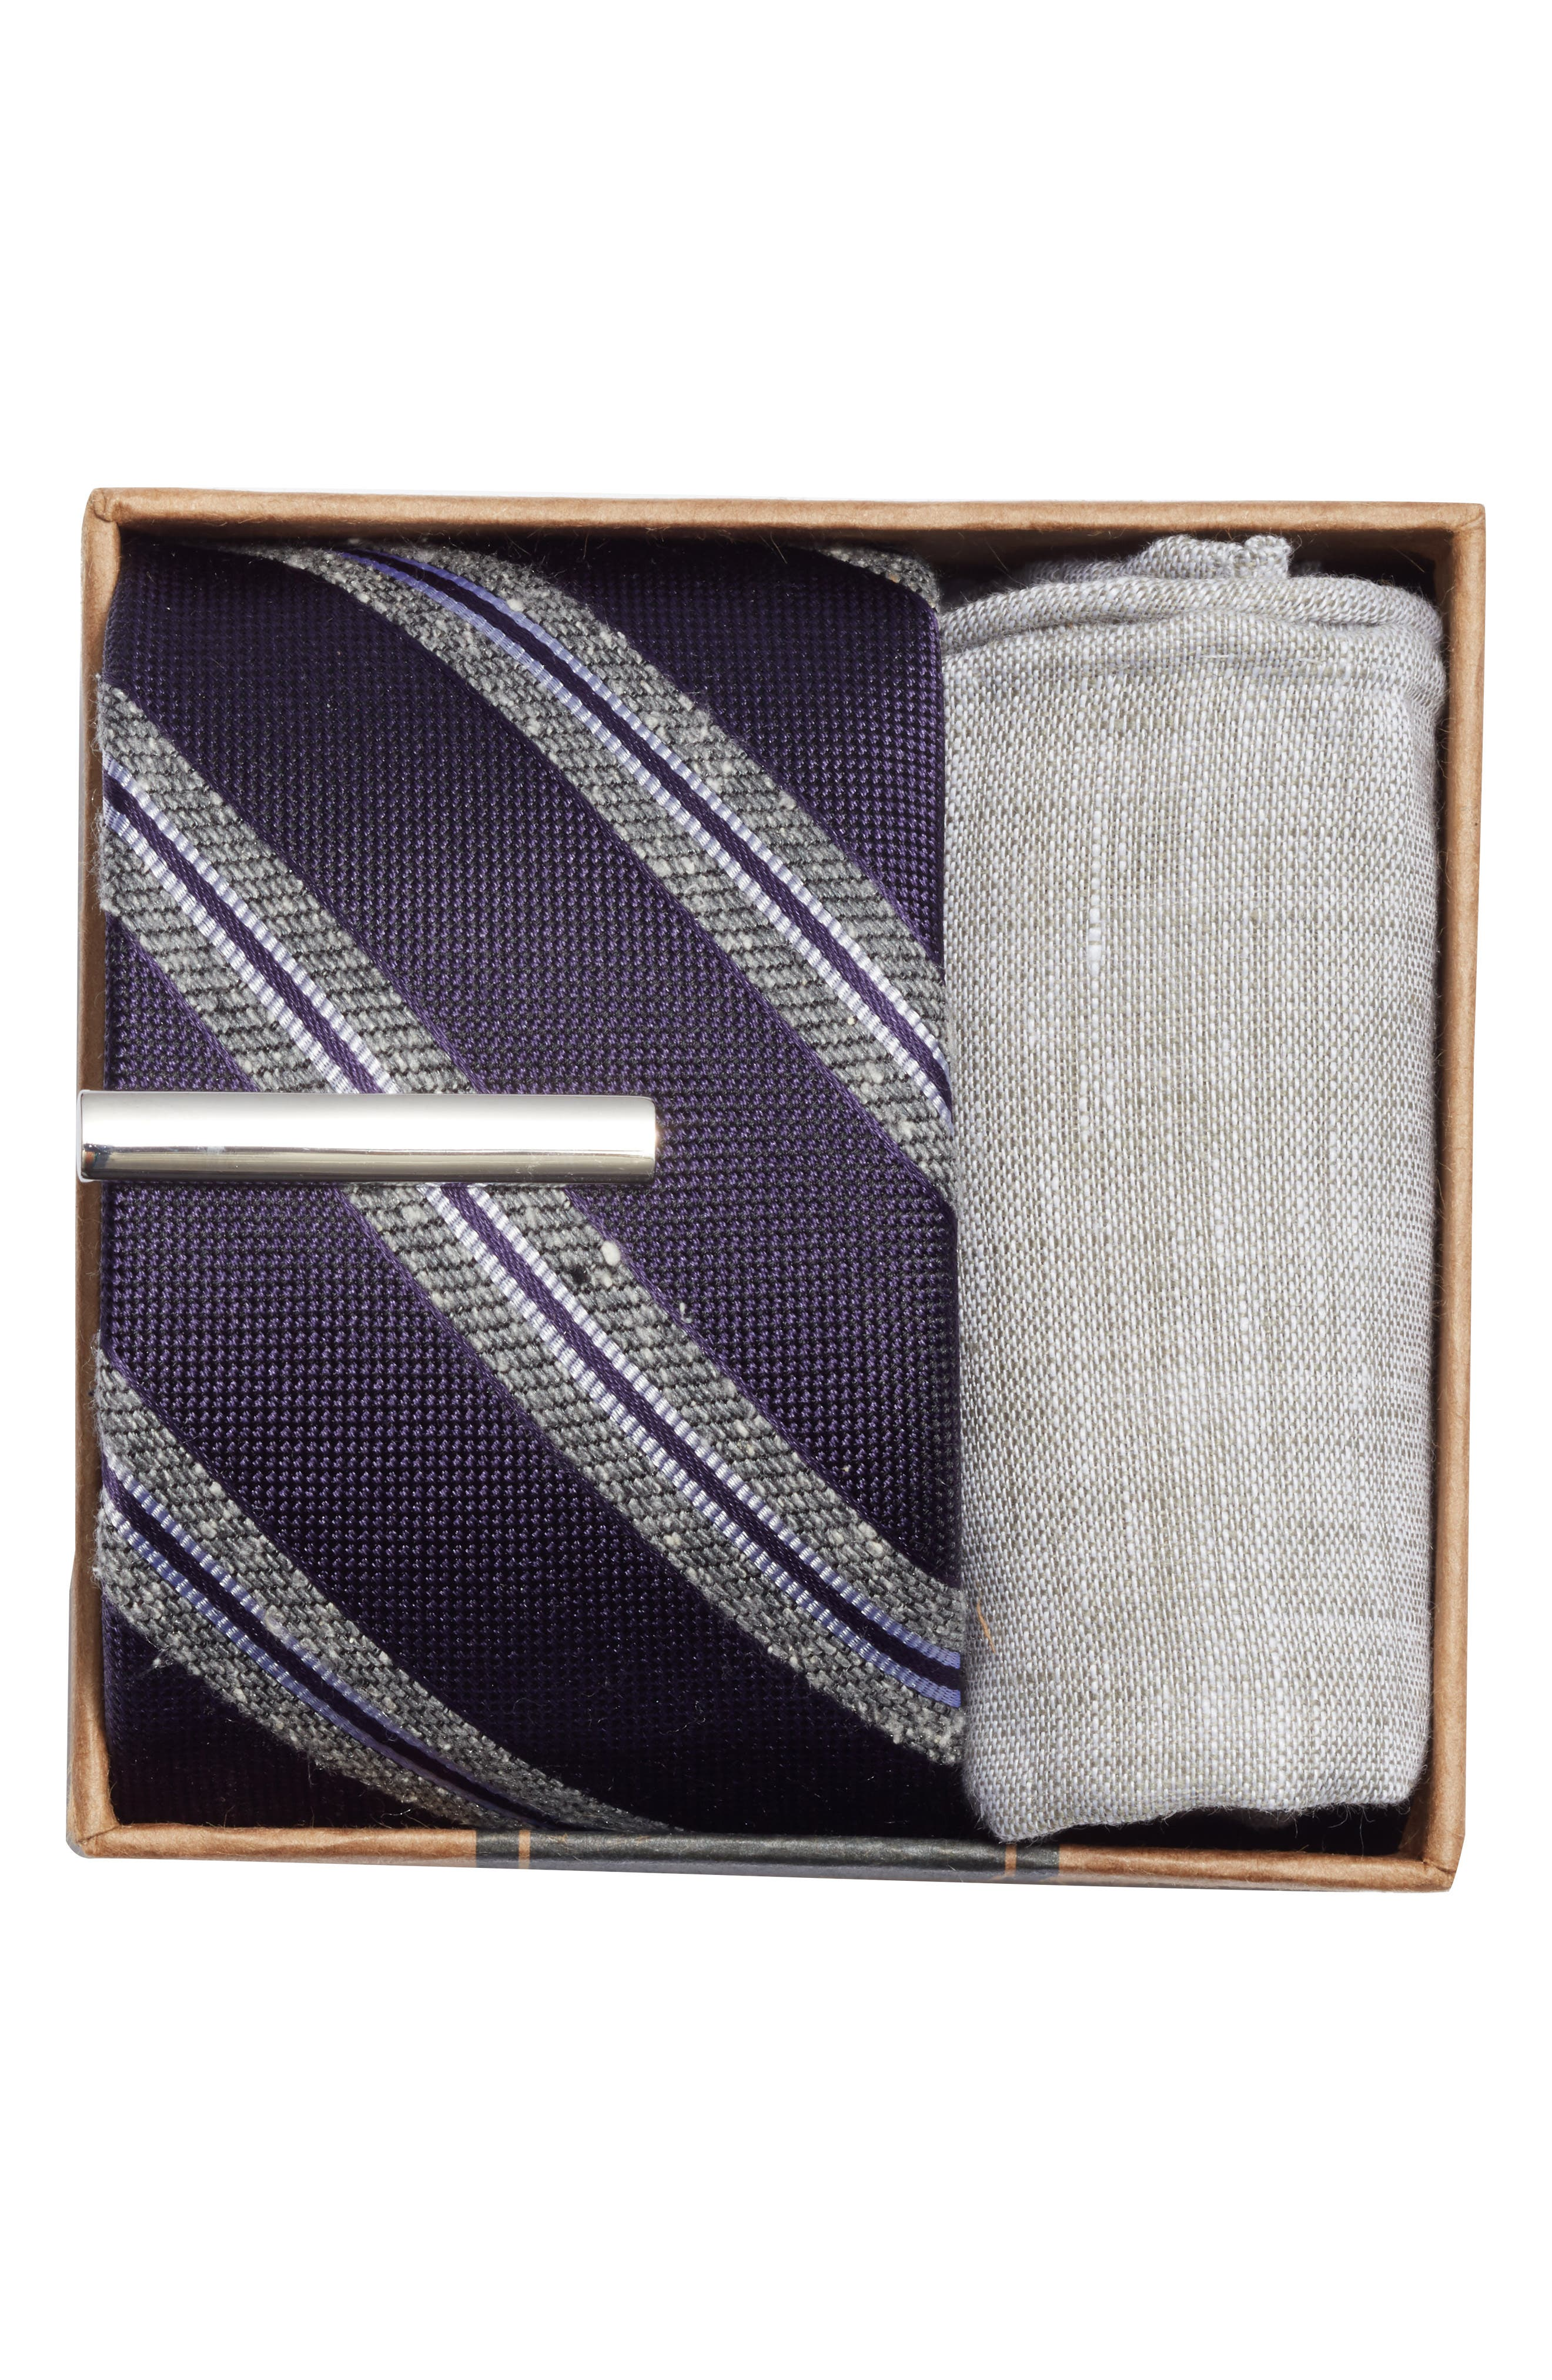 Edison Stripe 3-Piece Skinny Tie Style Box,                             Alternate thumbnail 2, color,                             Eggplant